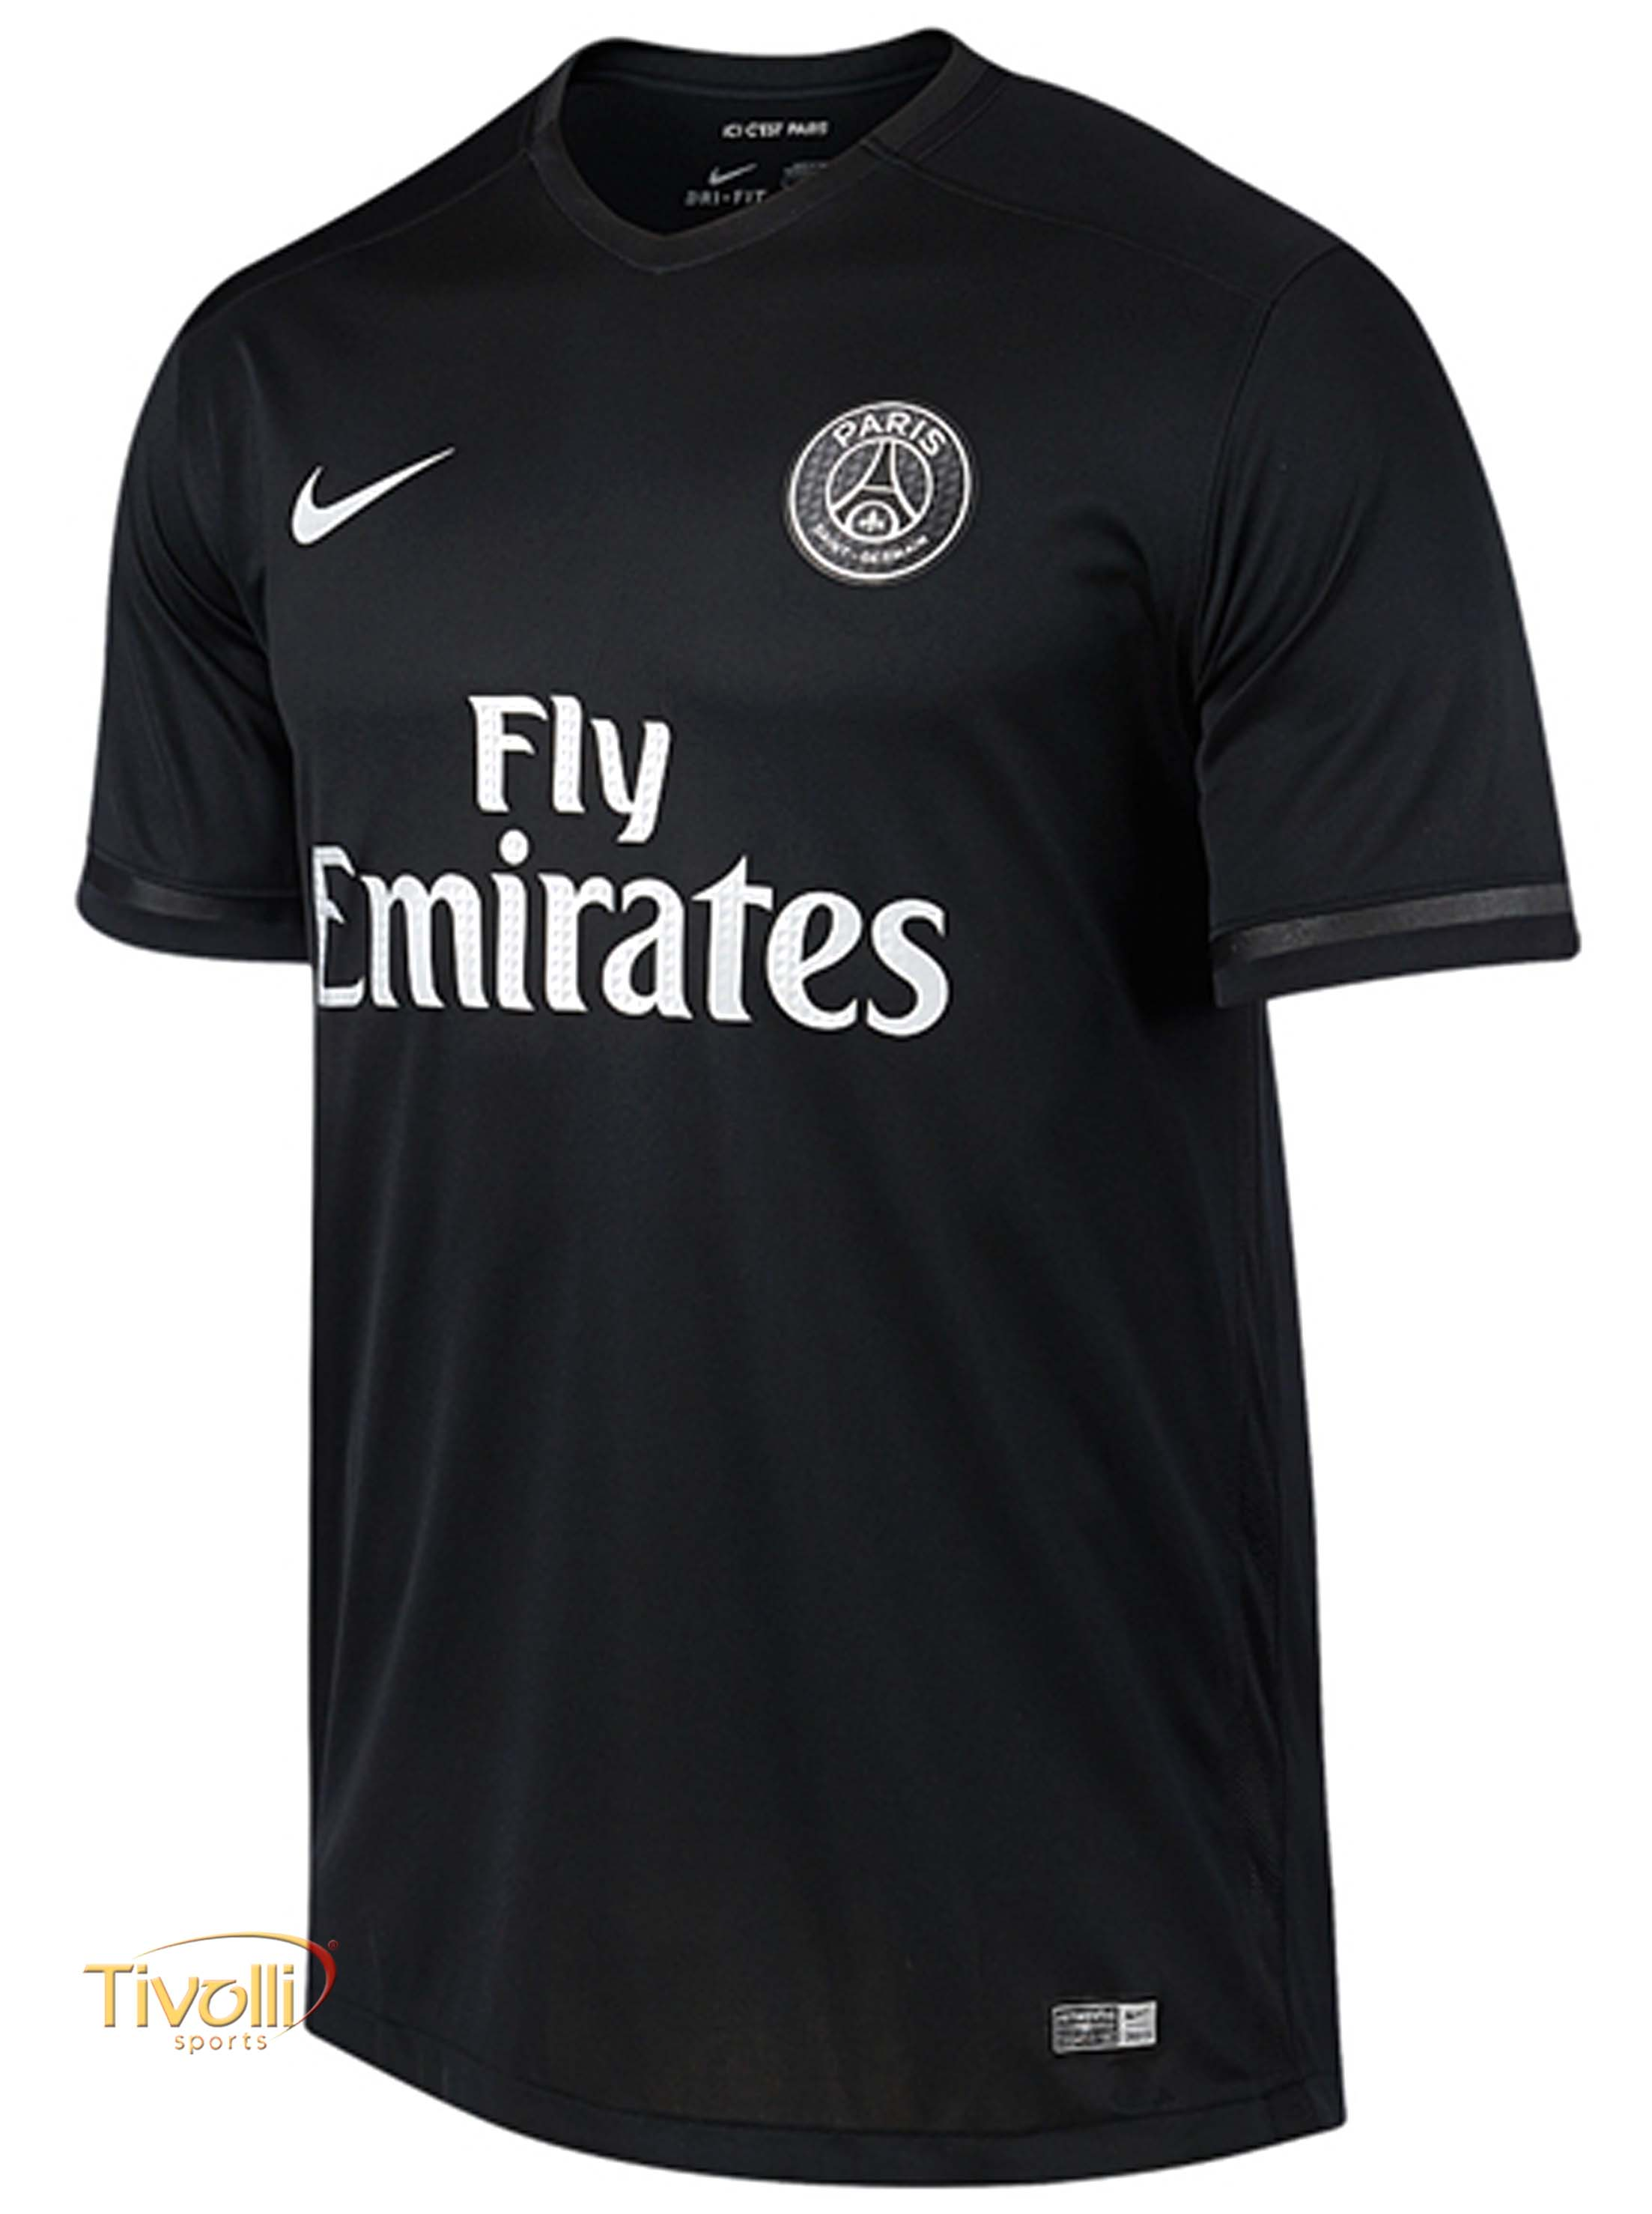 Camisa PSG Paris Saint-Germain III Nike Masculina Torcedor 2015 2016 Preta 039a6664b70b8